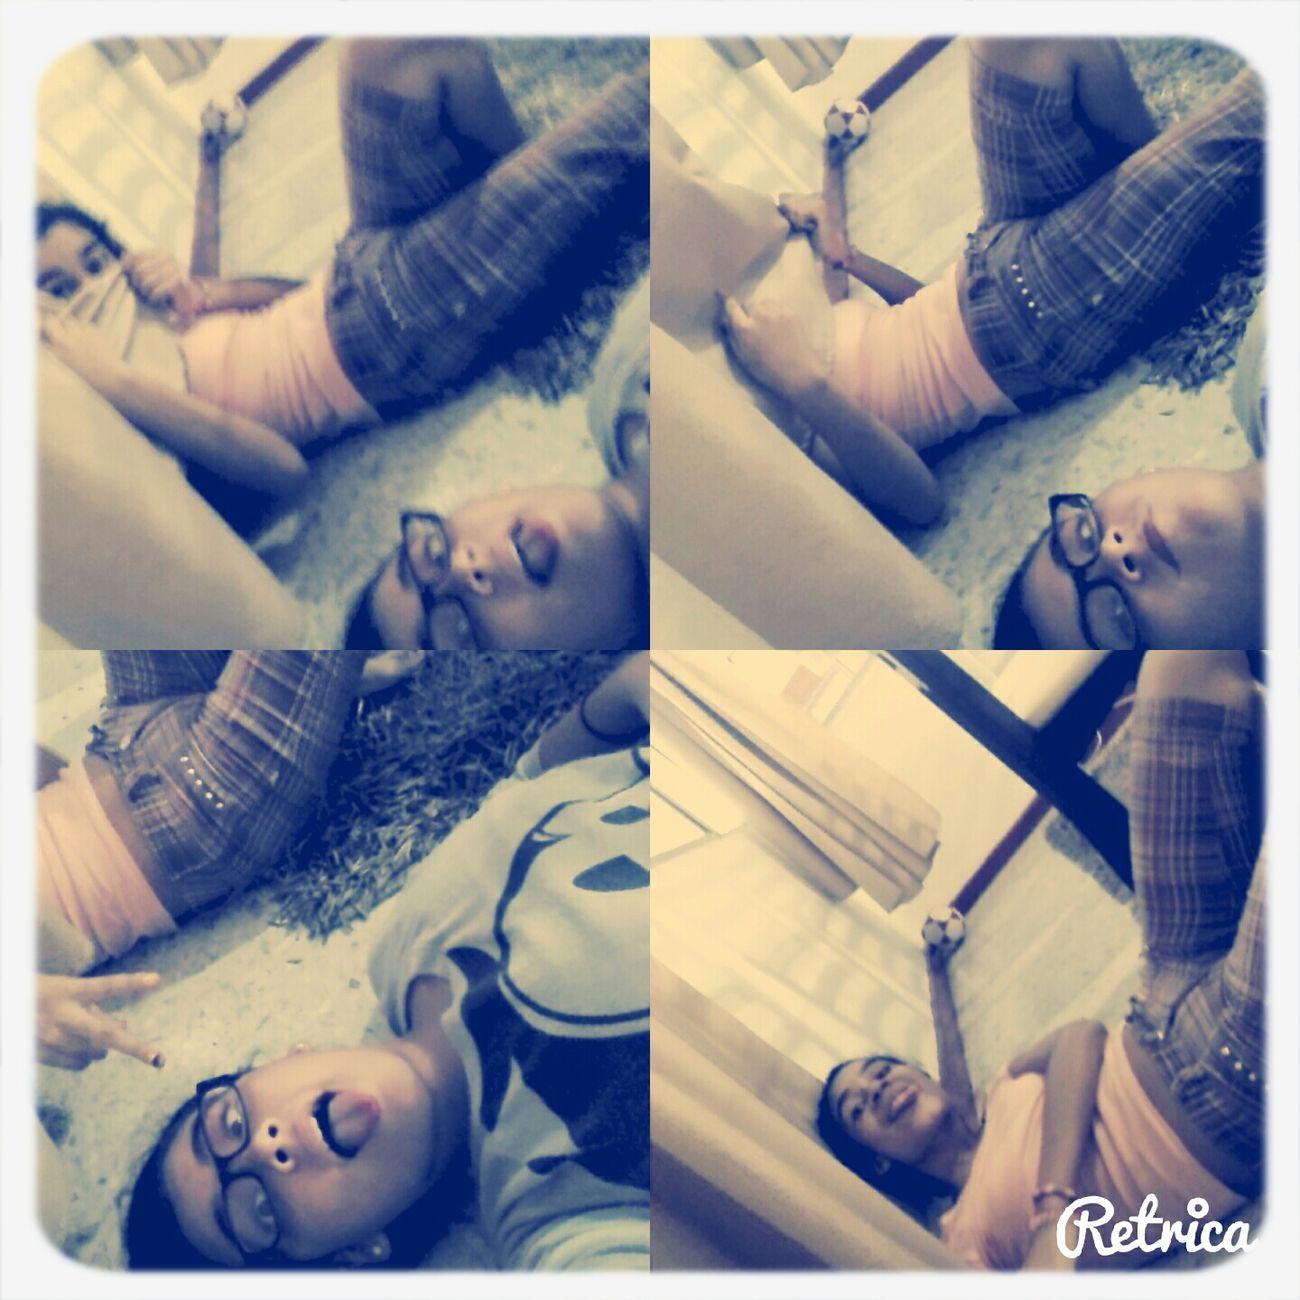 te adoro bebe ♥♥♥ Relaxing